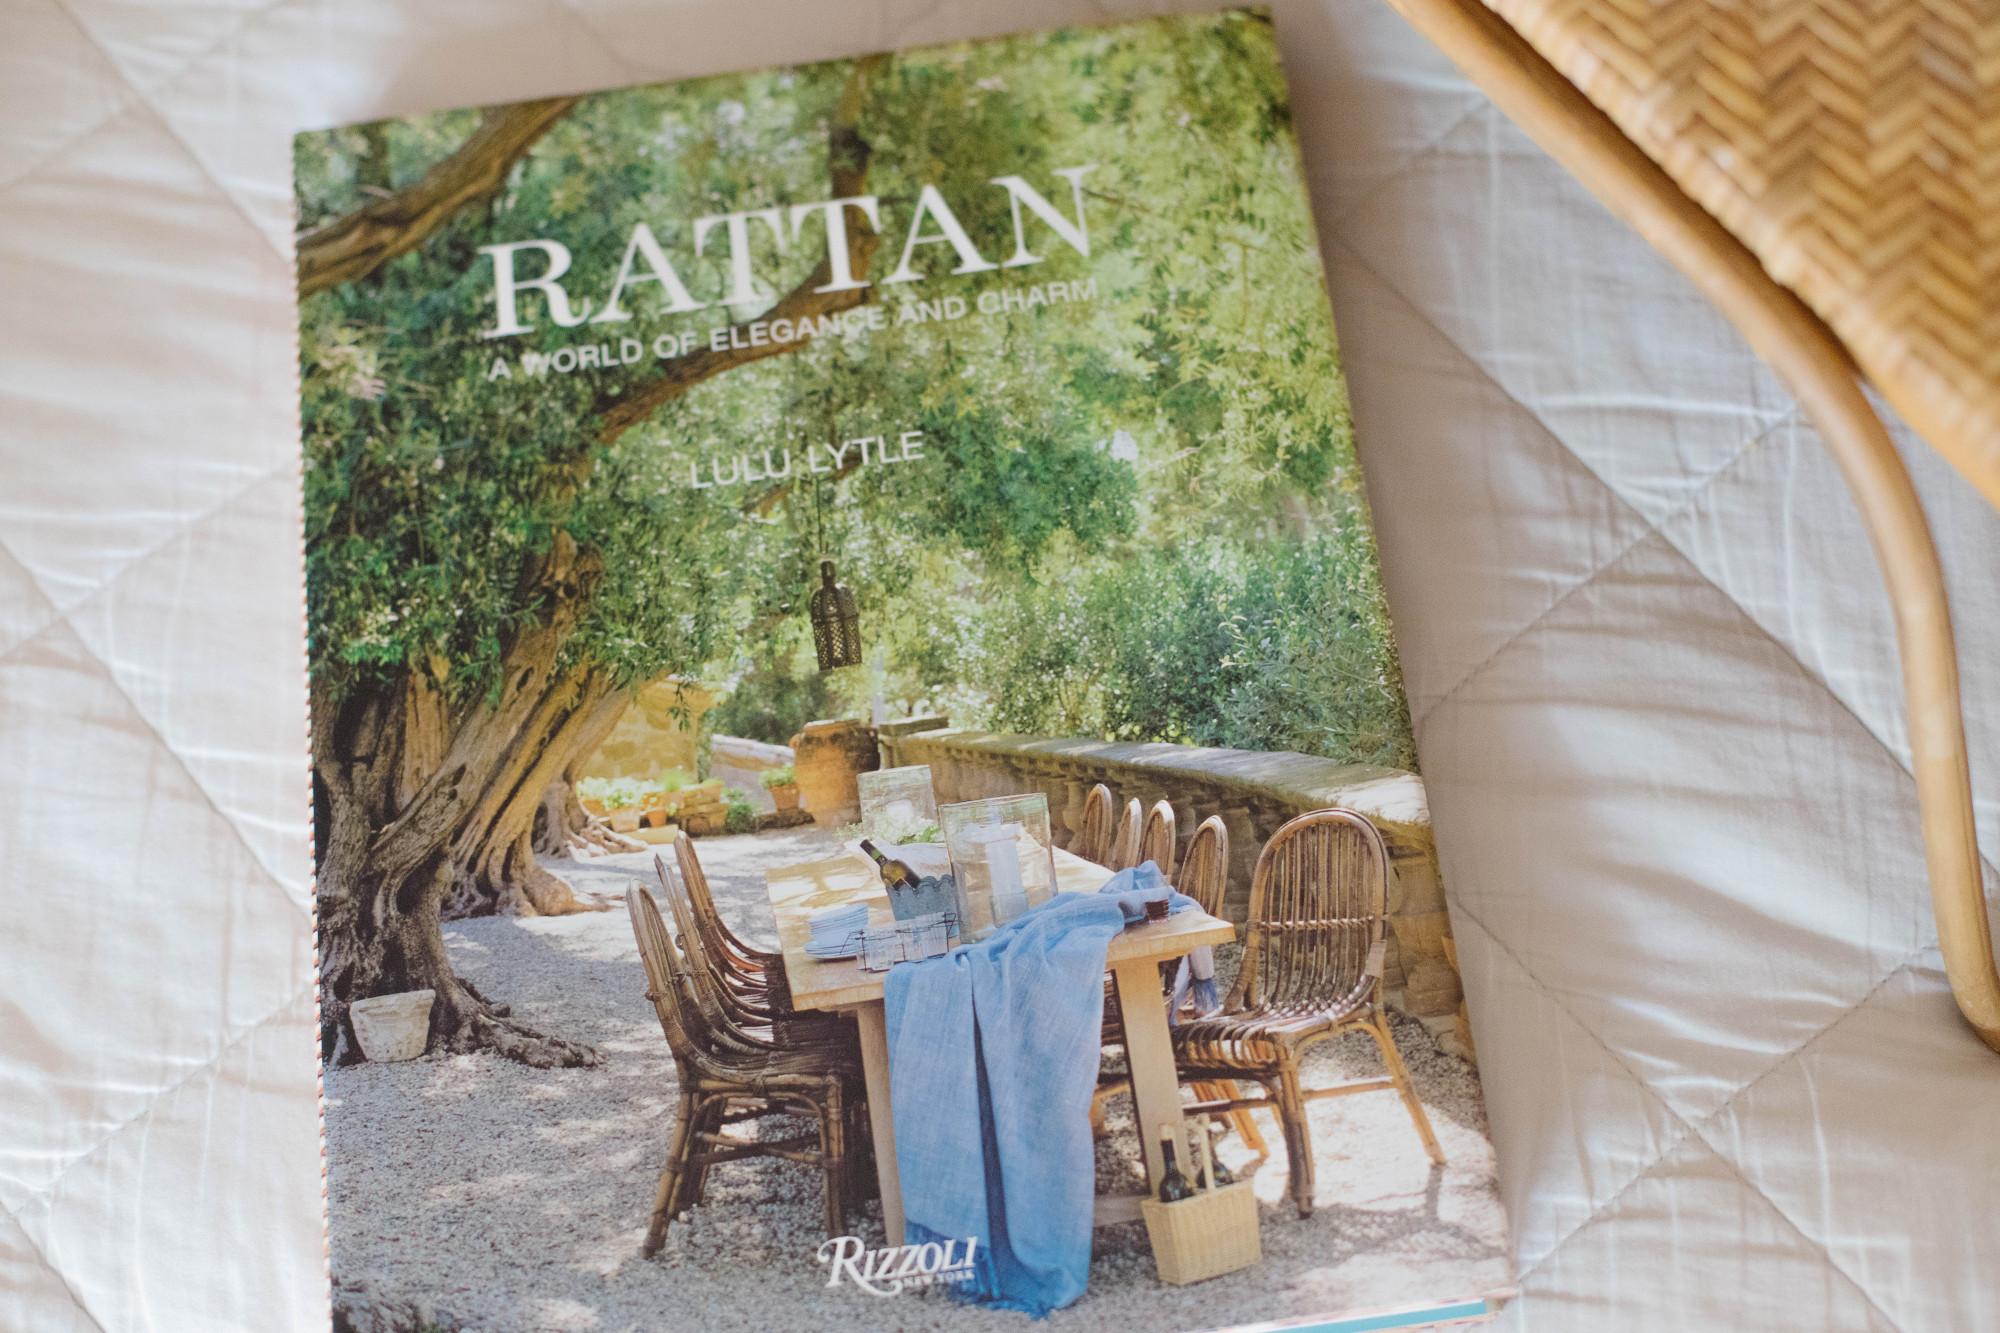 rattan book rizzoli